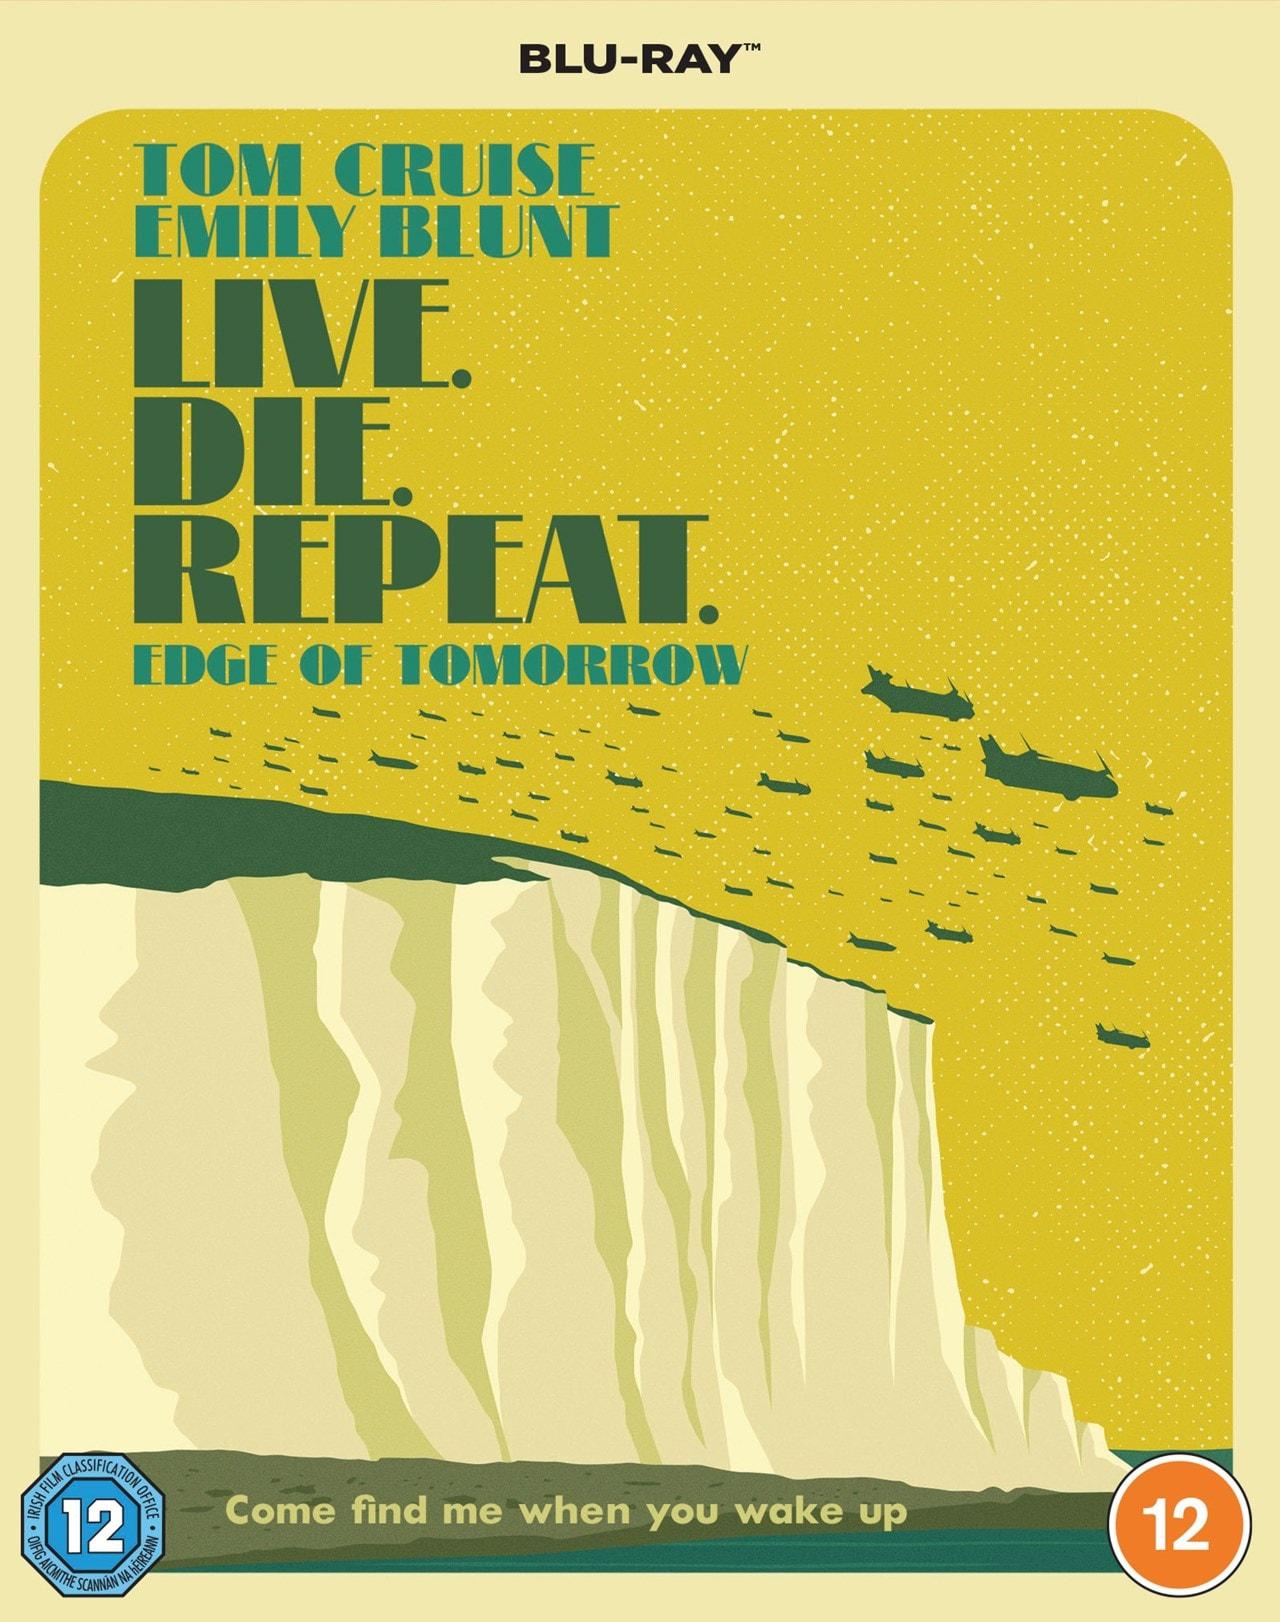 Edge of Tomorrow - Travel Poster Edition - 2